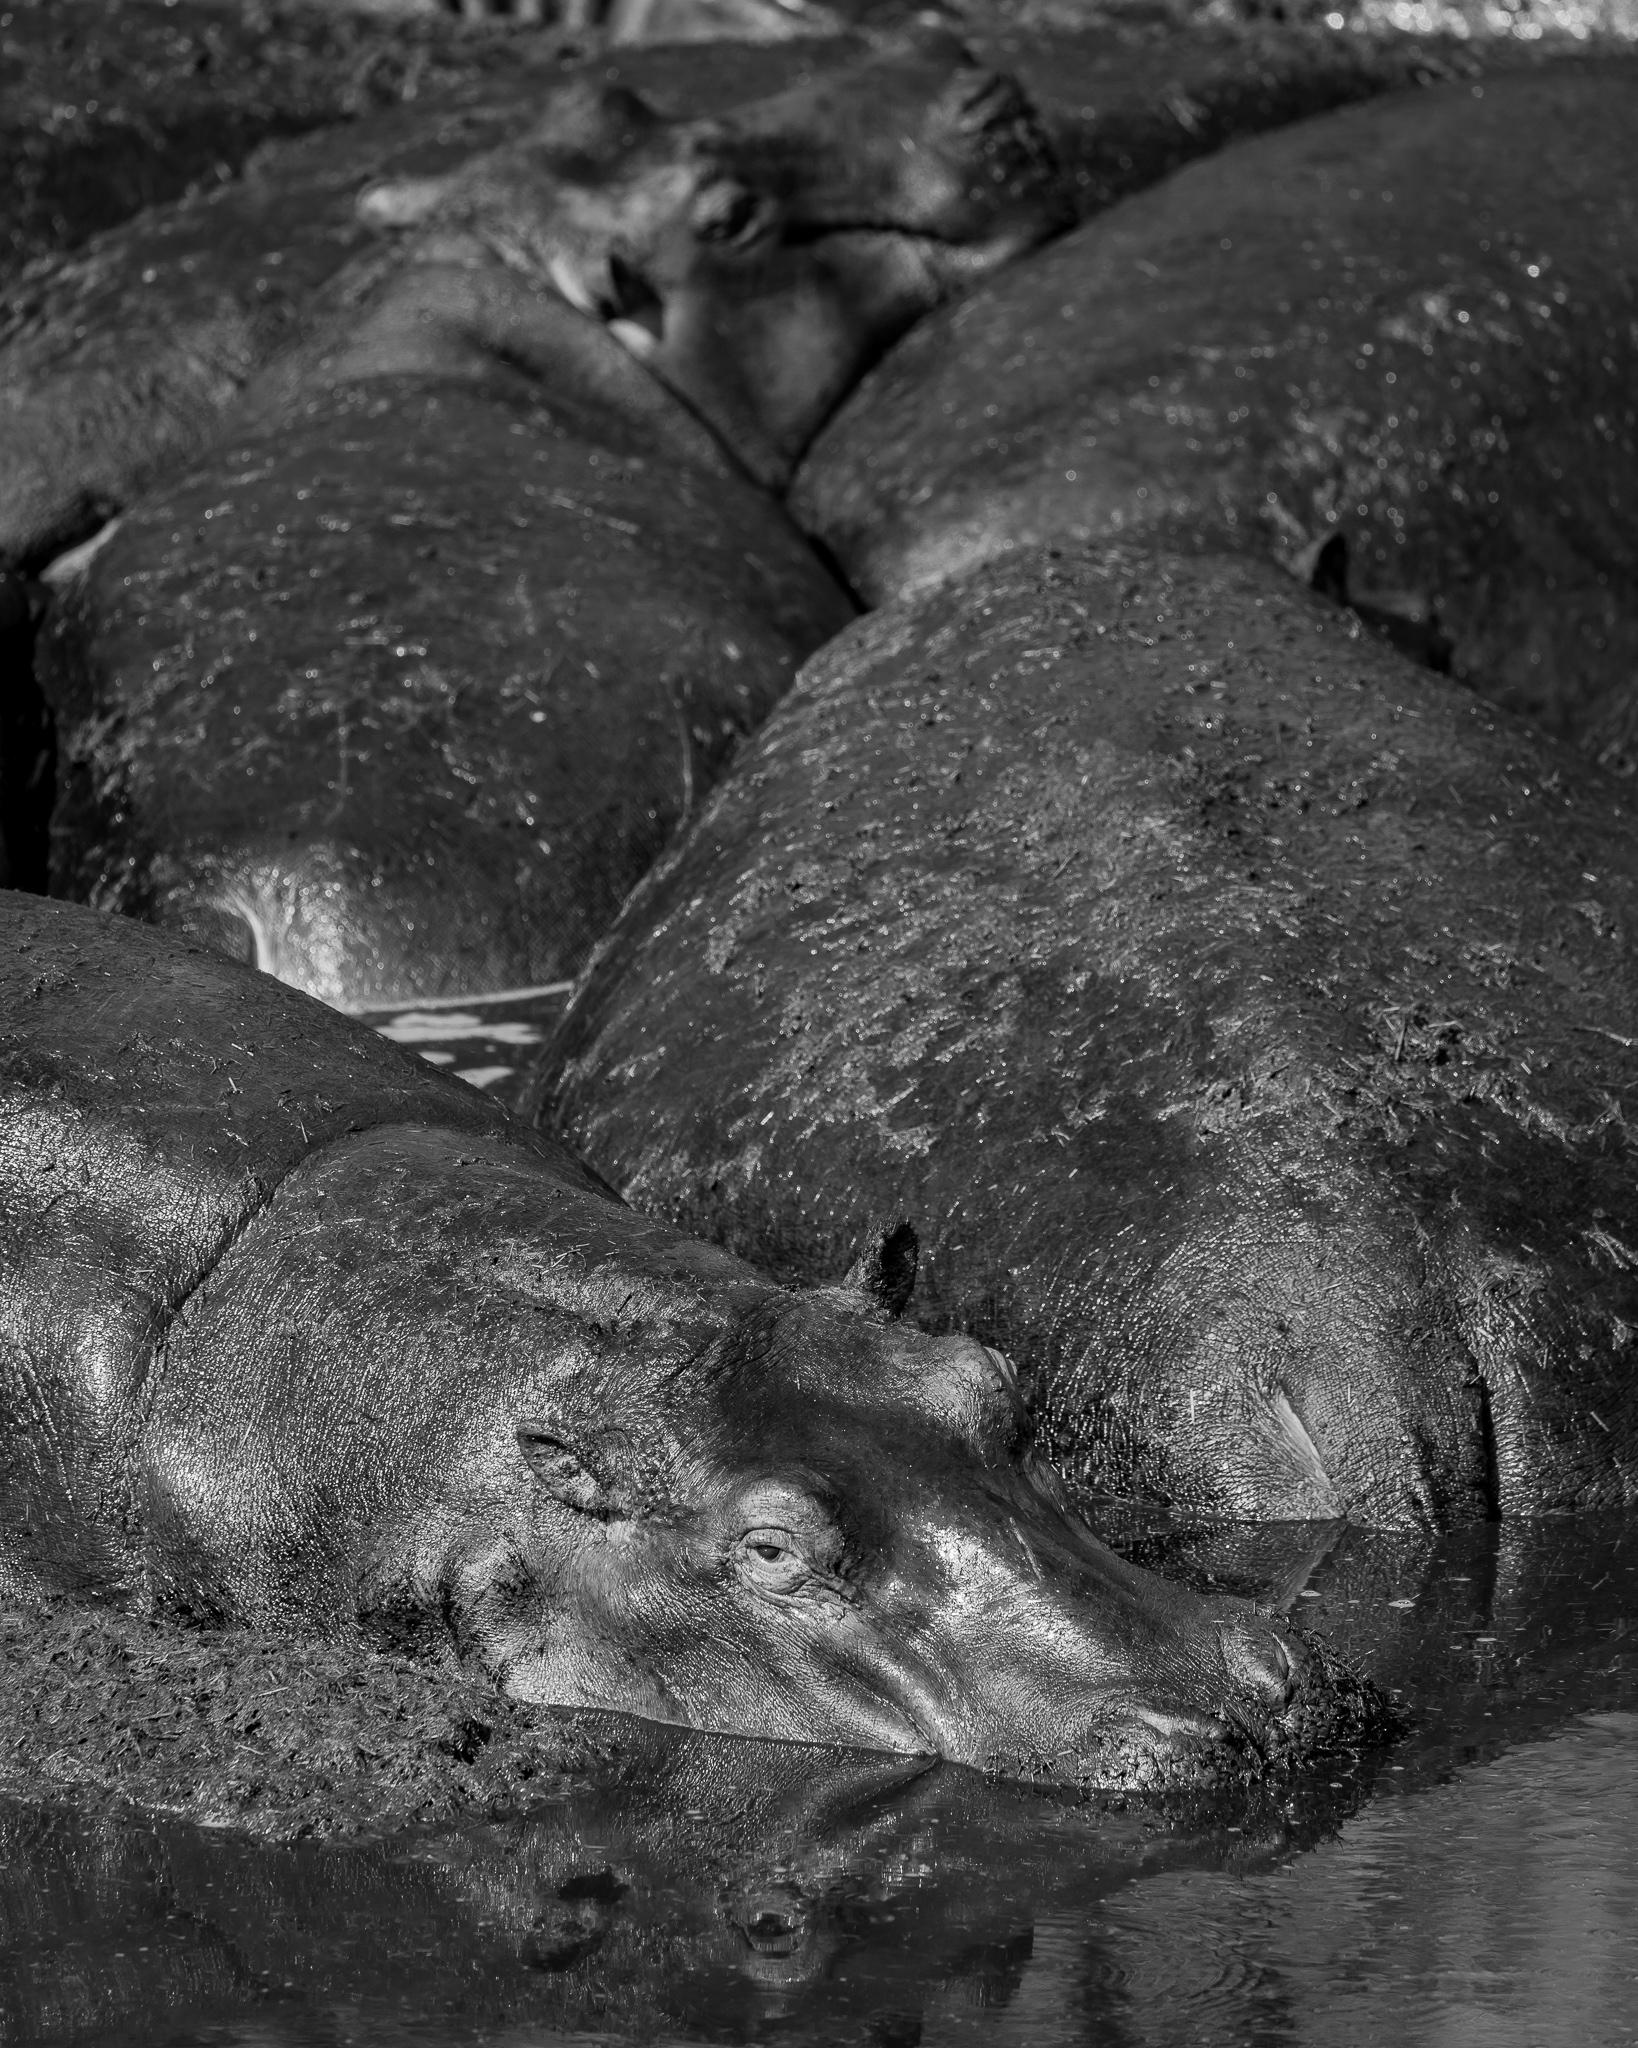 Hippo Naptime